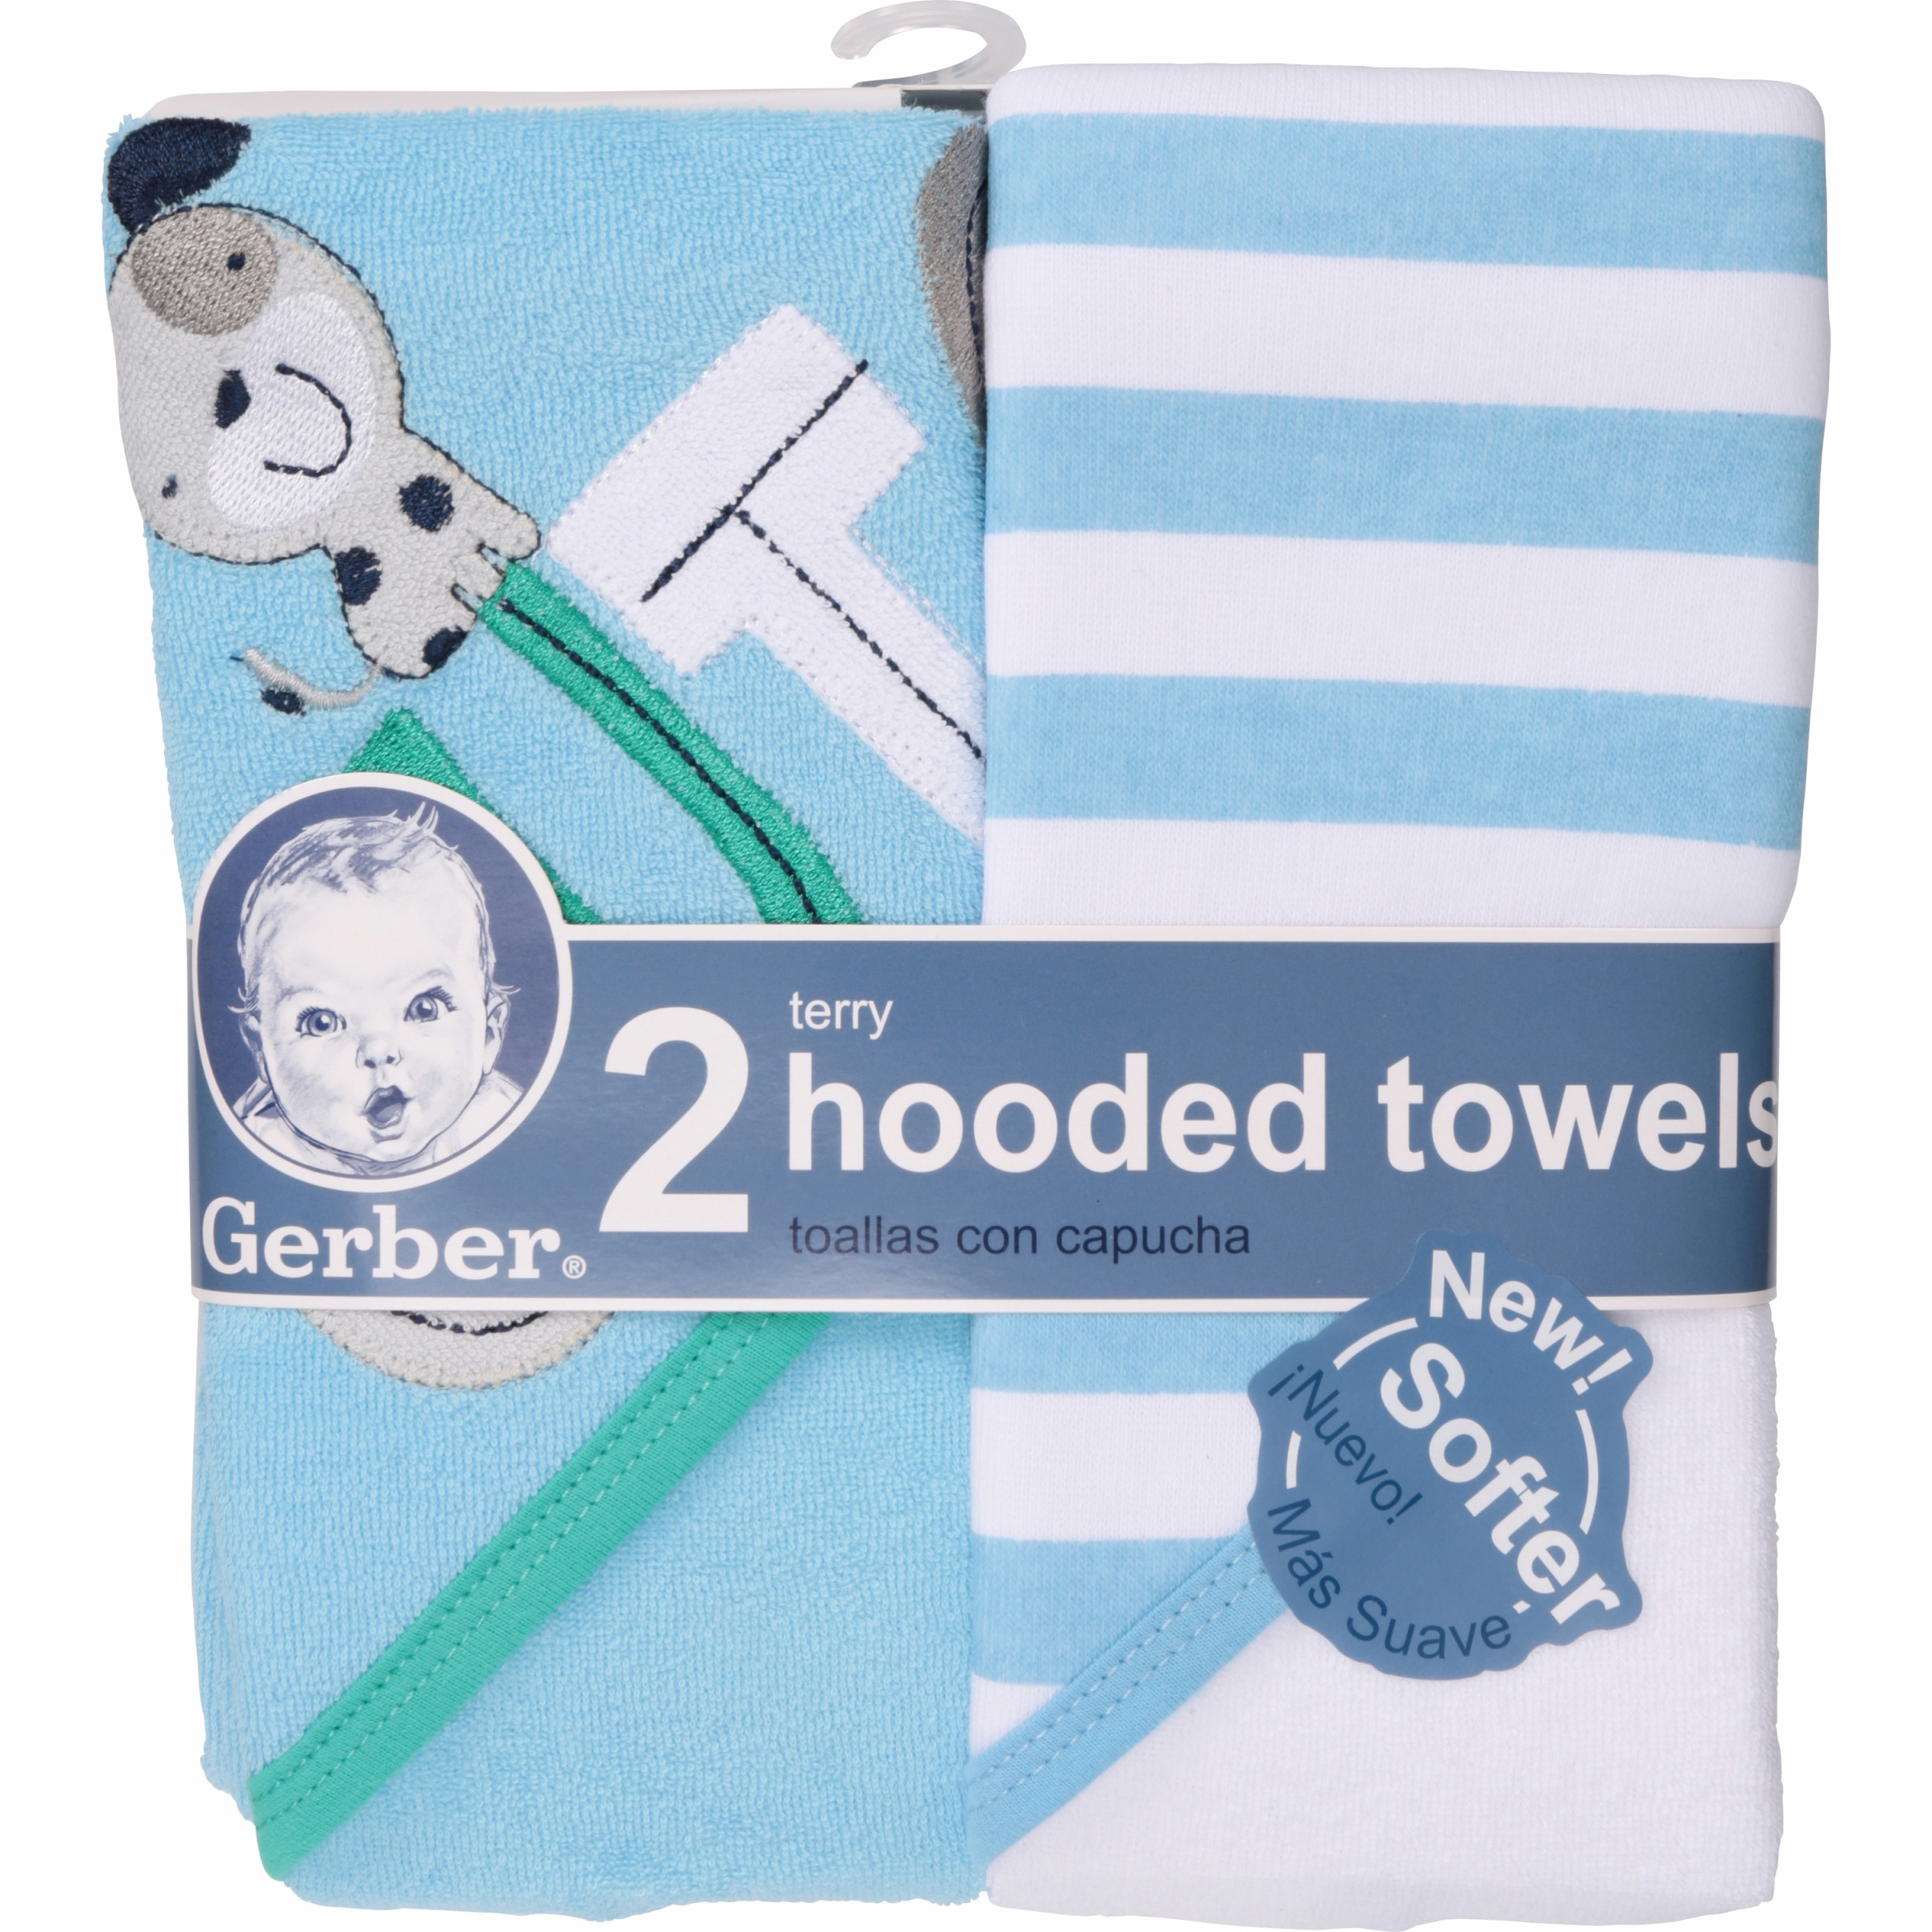 Gerber Newborn Baby Boy Terry Hooded Bath Towel, Dog, 2 Pack